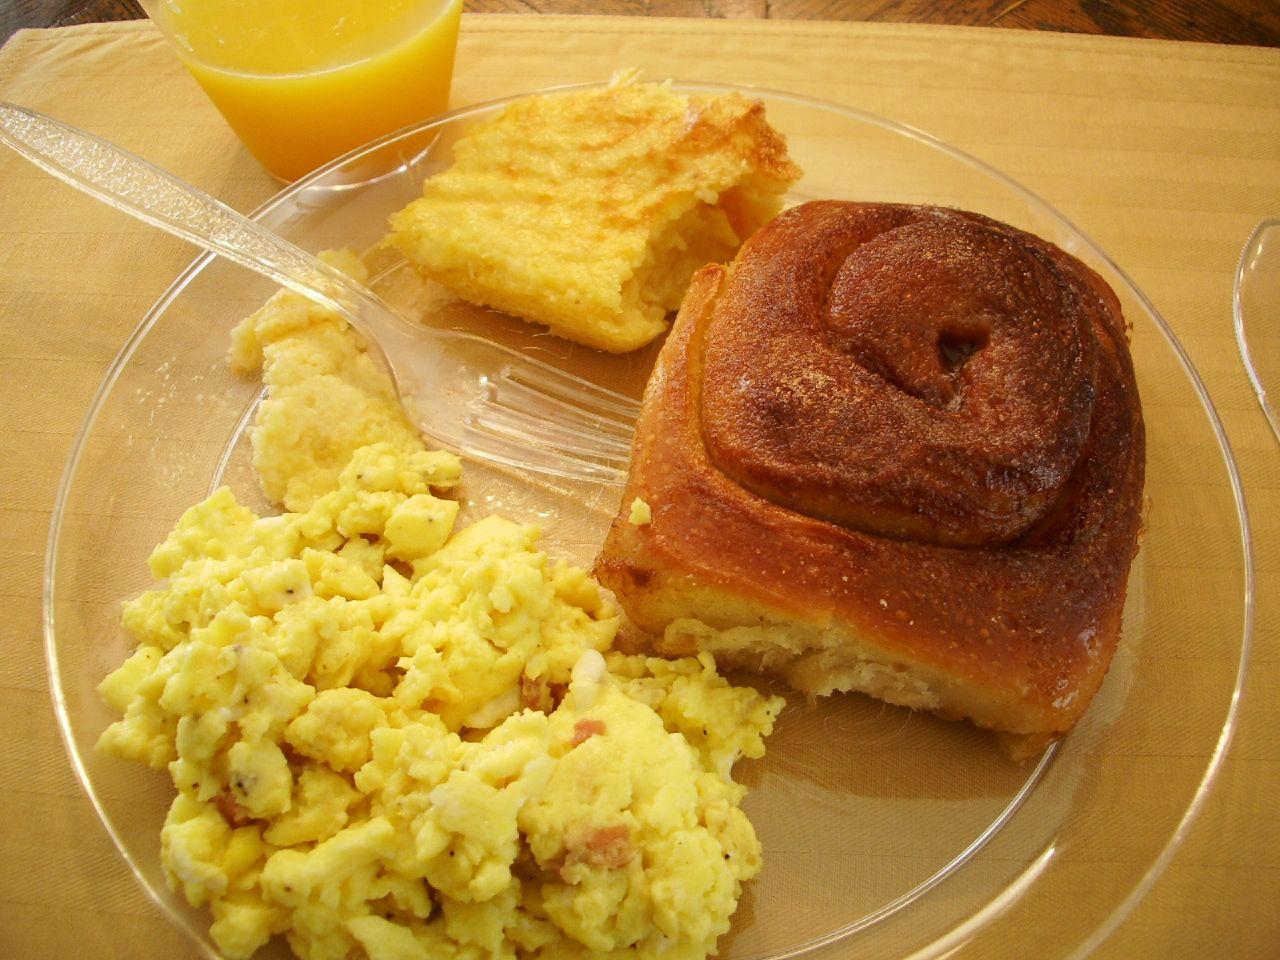 Healthy Breakfast In Hotel Room